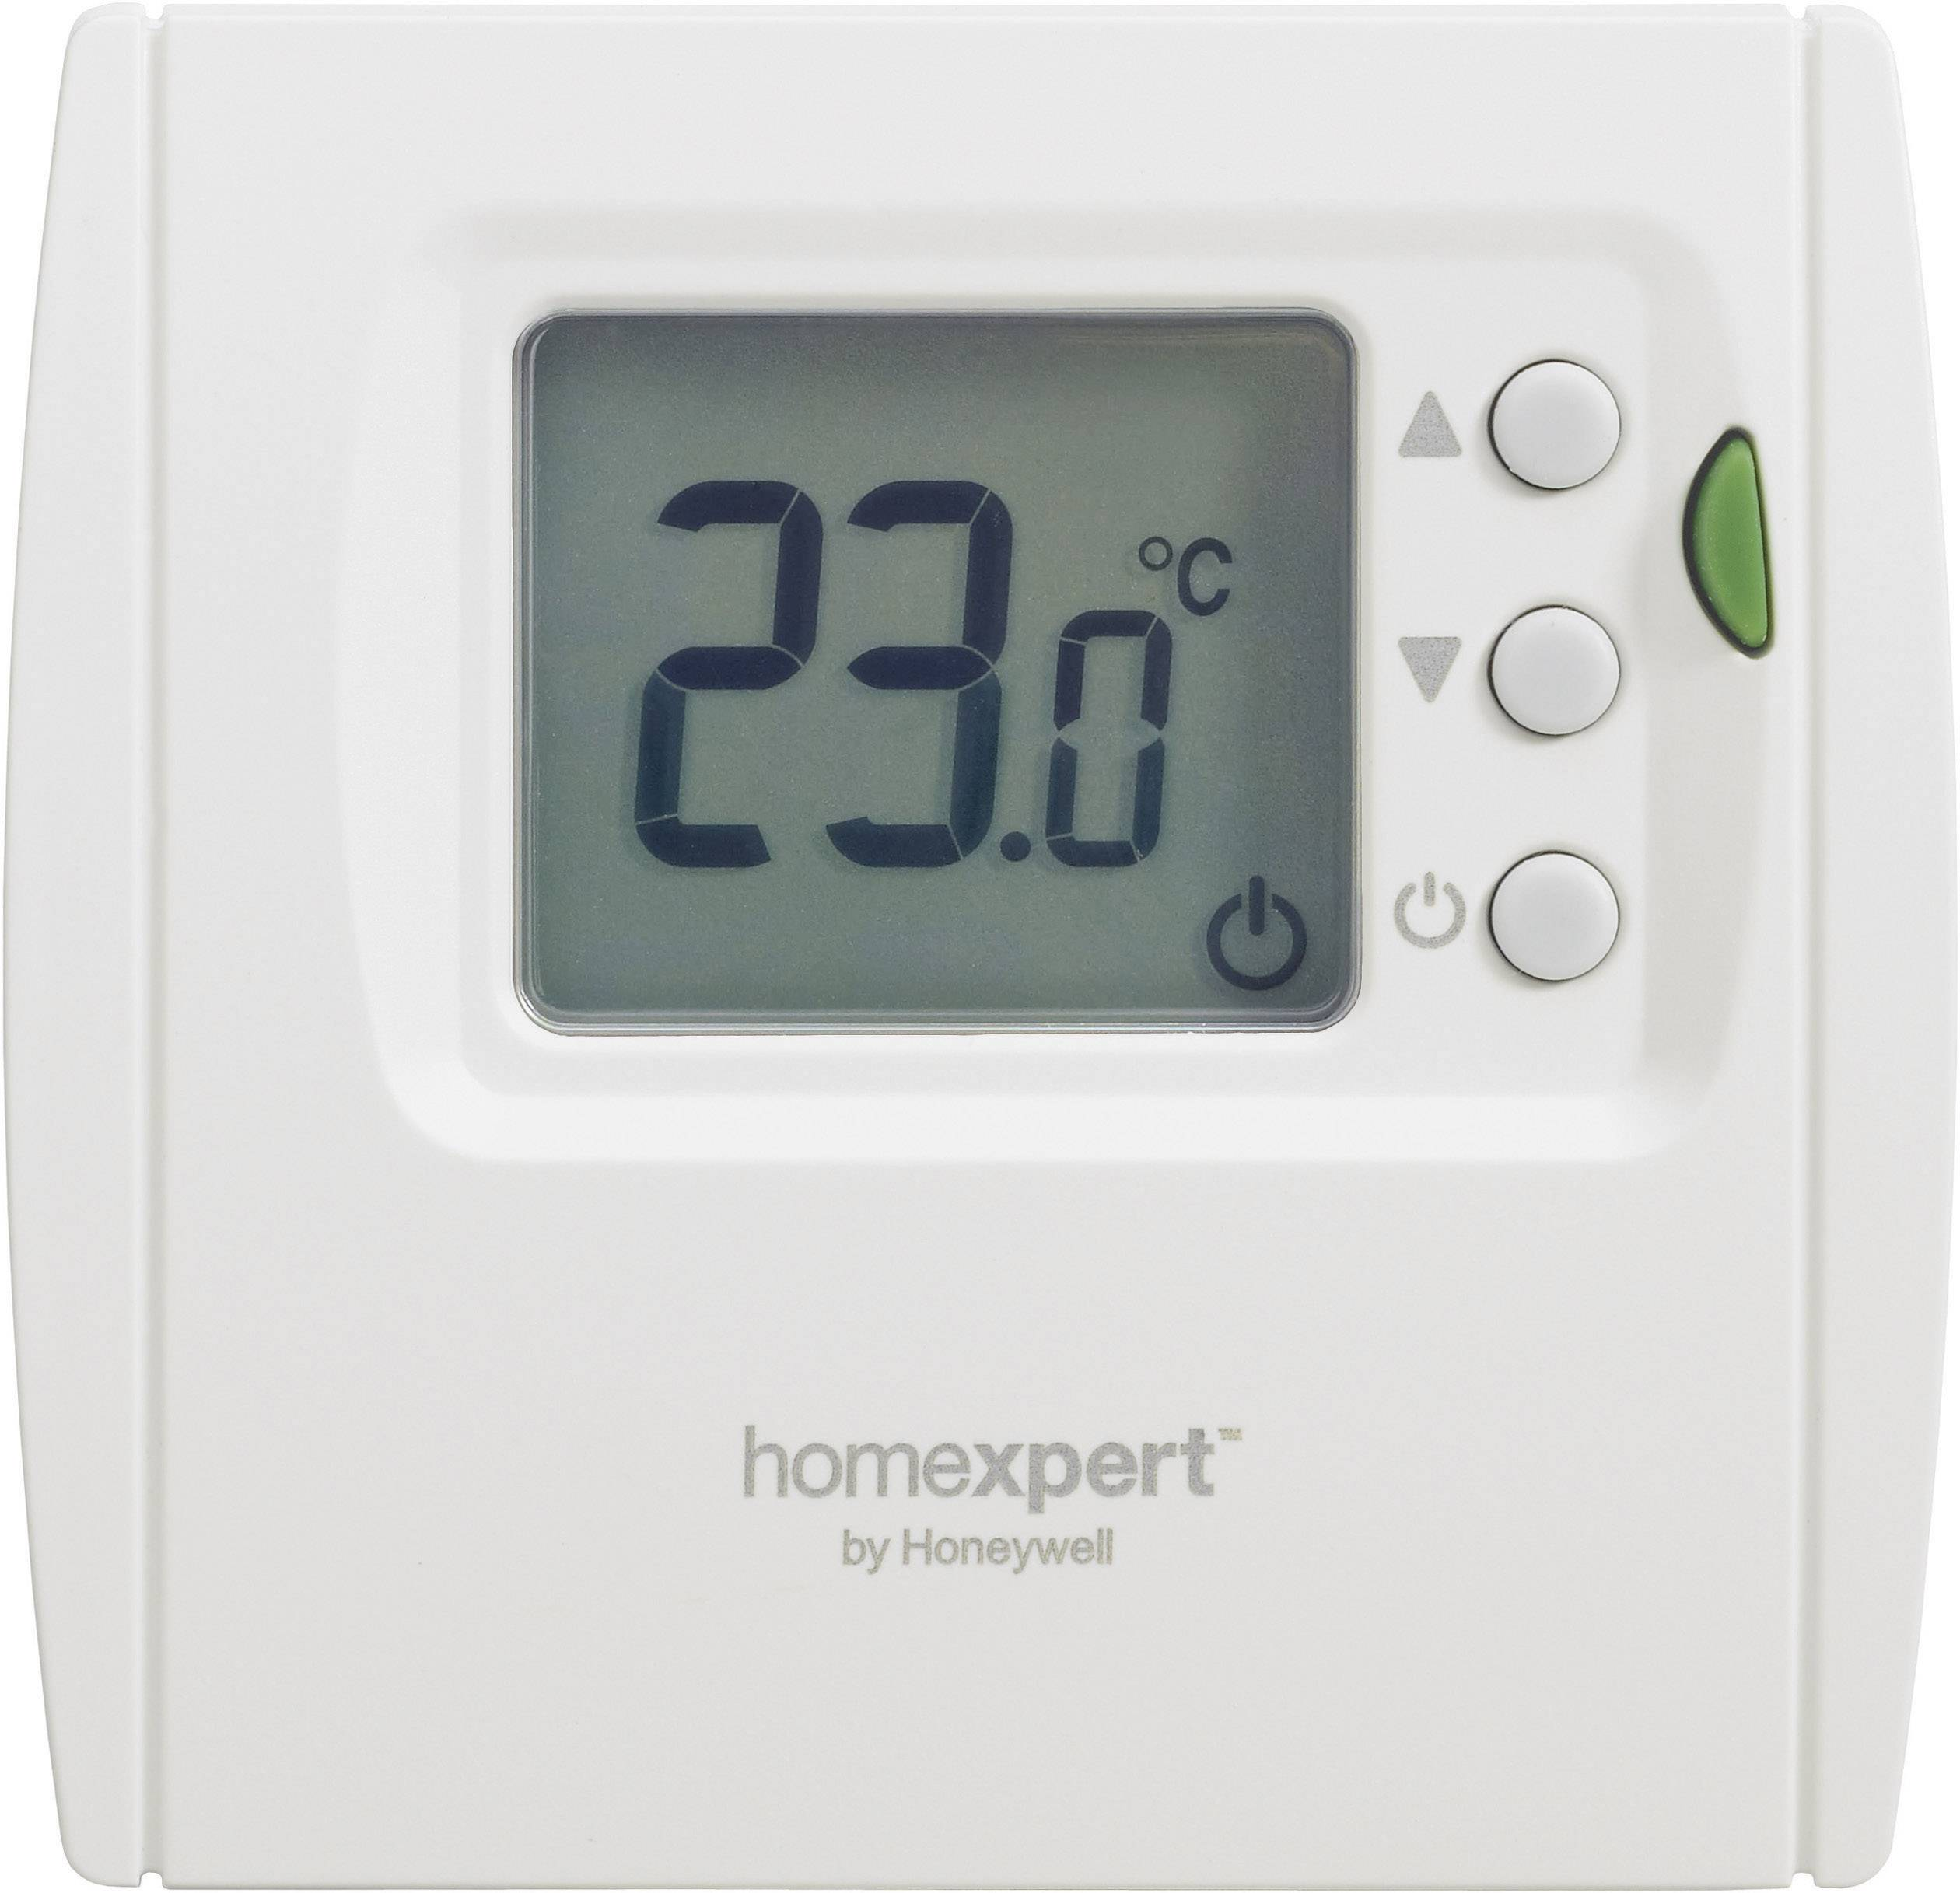 Izbový termostat Homexpert by Honeywell THR840DBG, 5 až 35 °C, biely